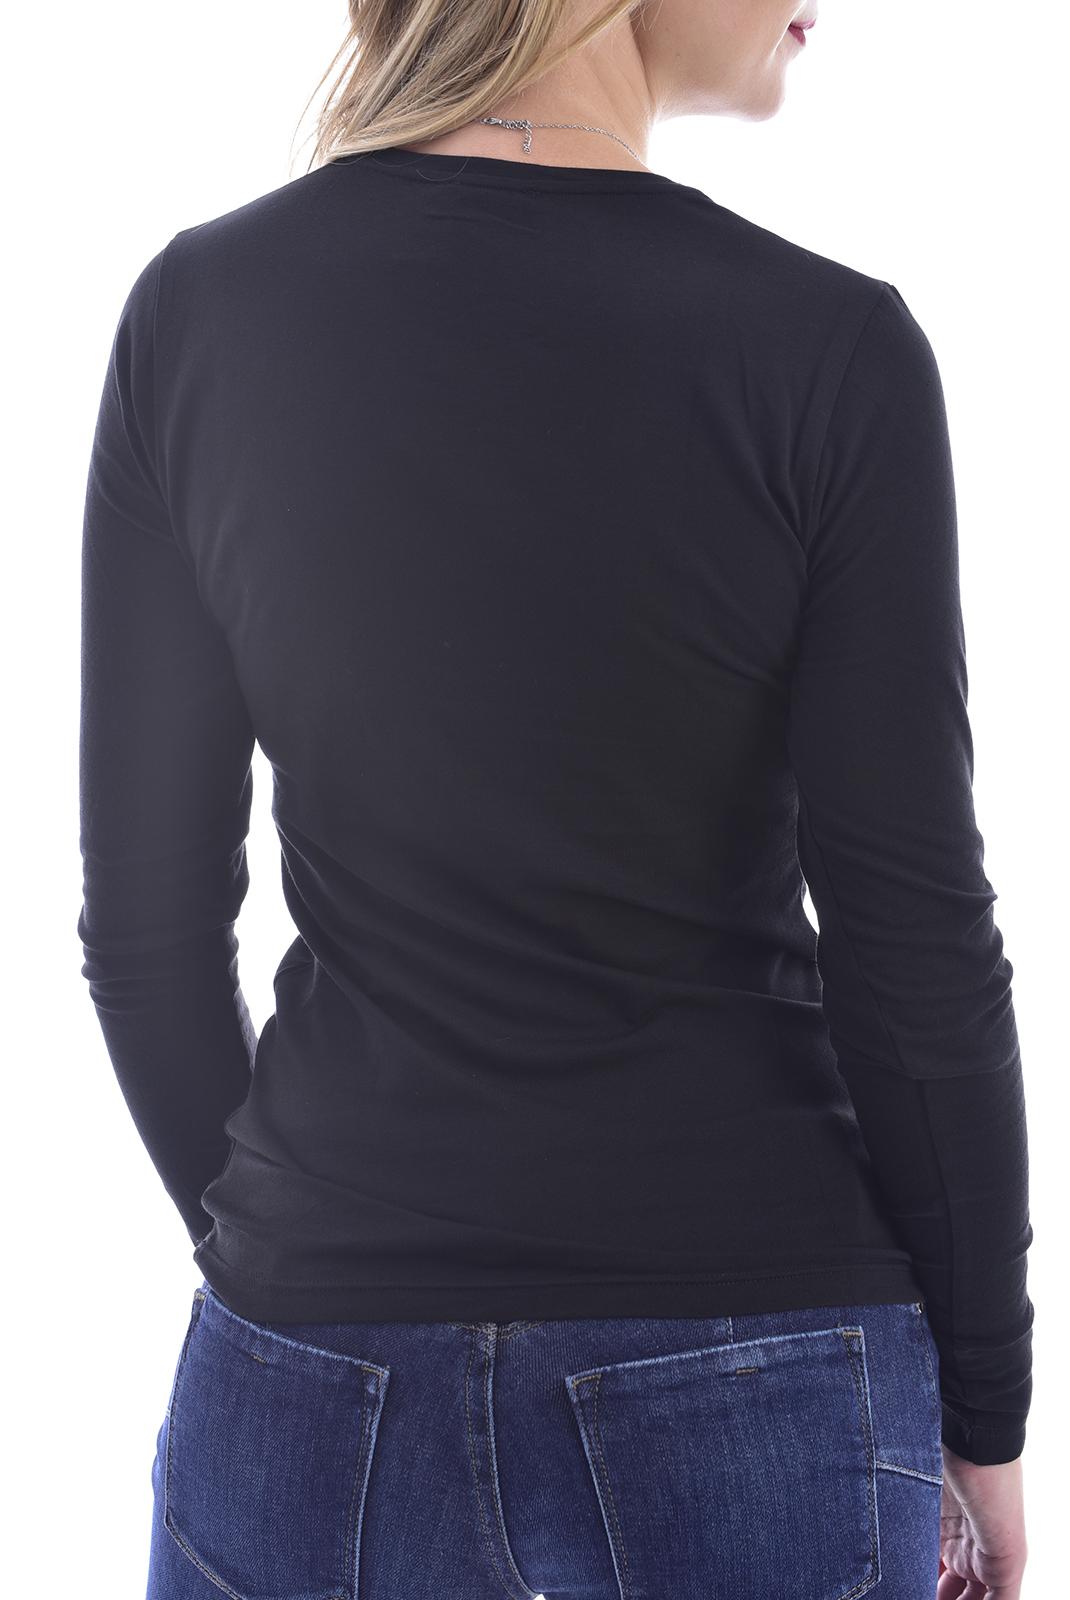 Tee shirt manches longues  Emporio armani 163229 0A263 020 BLACK